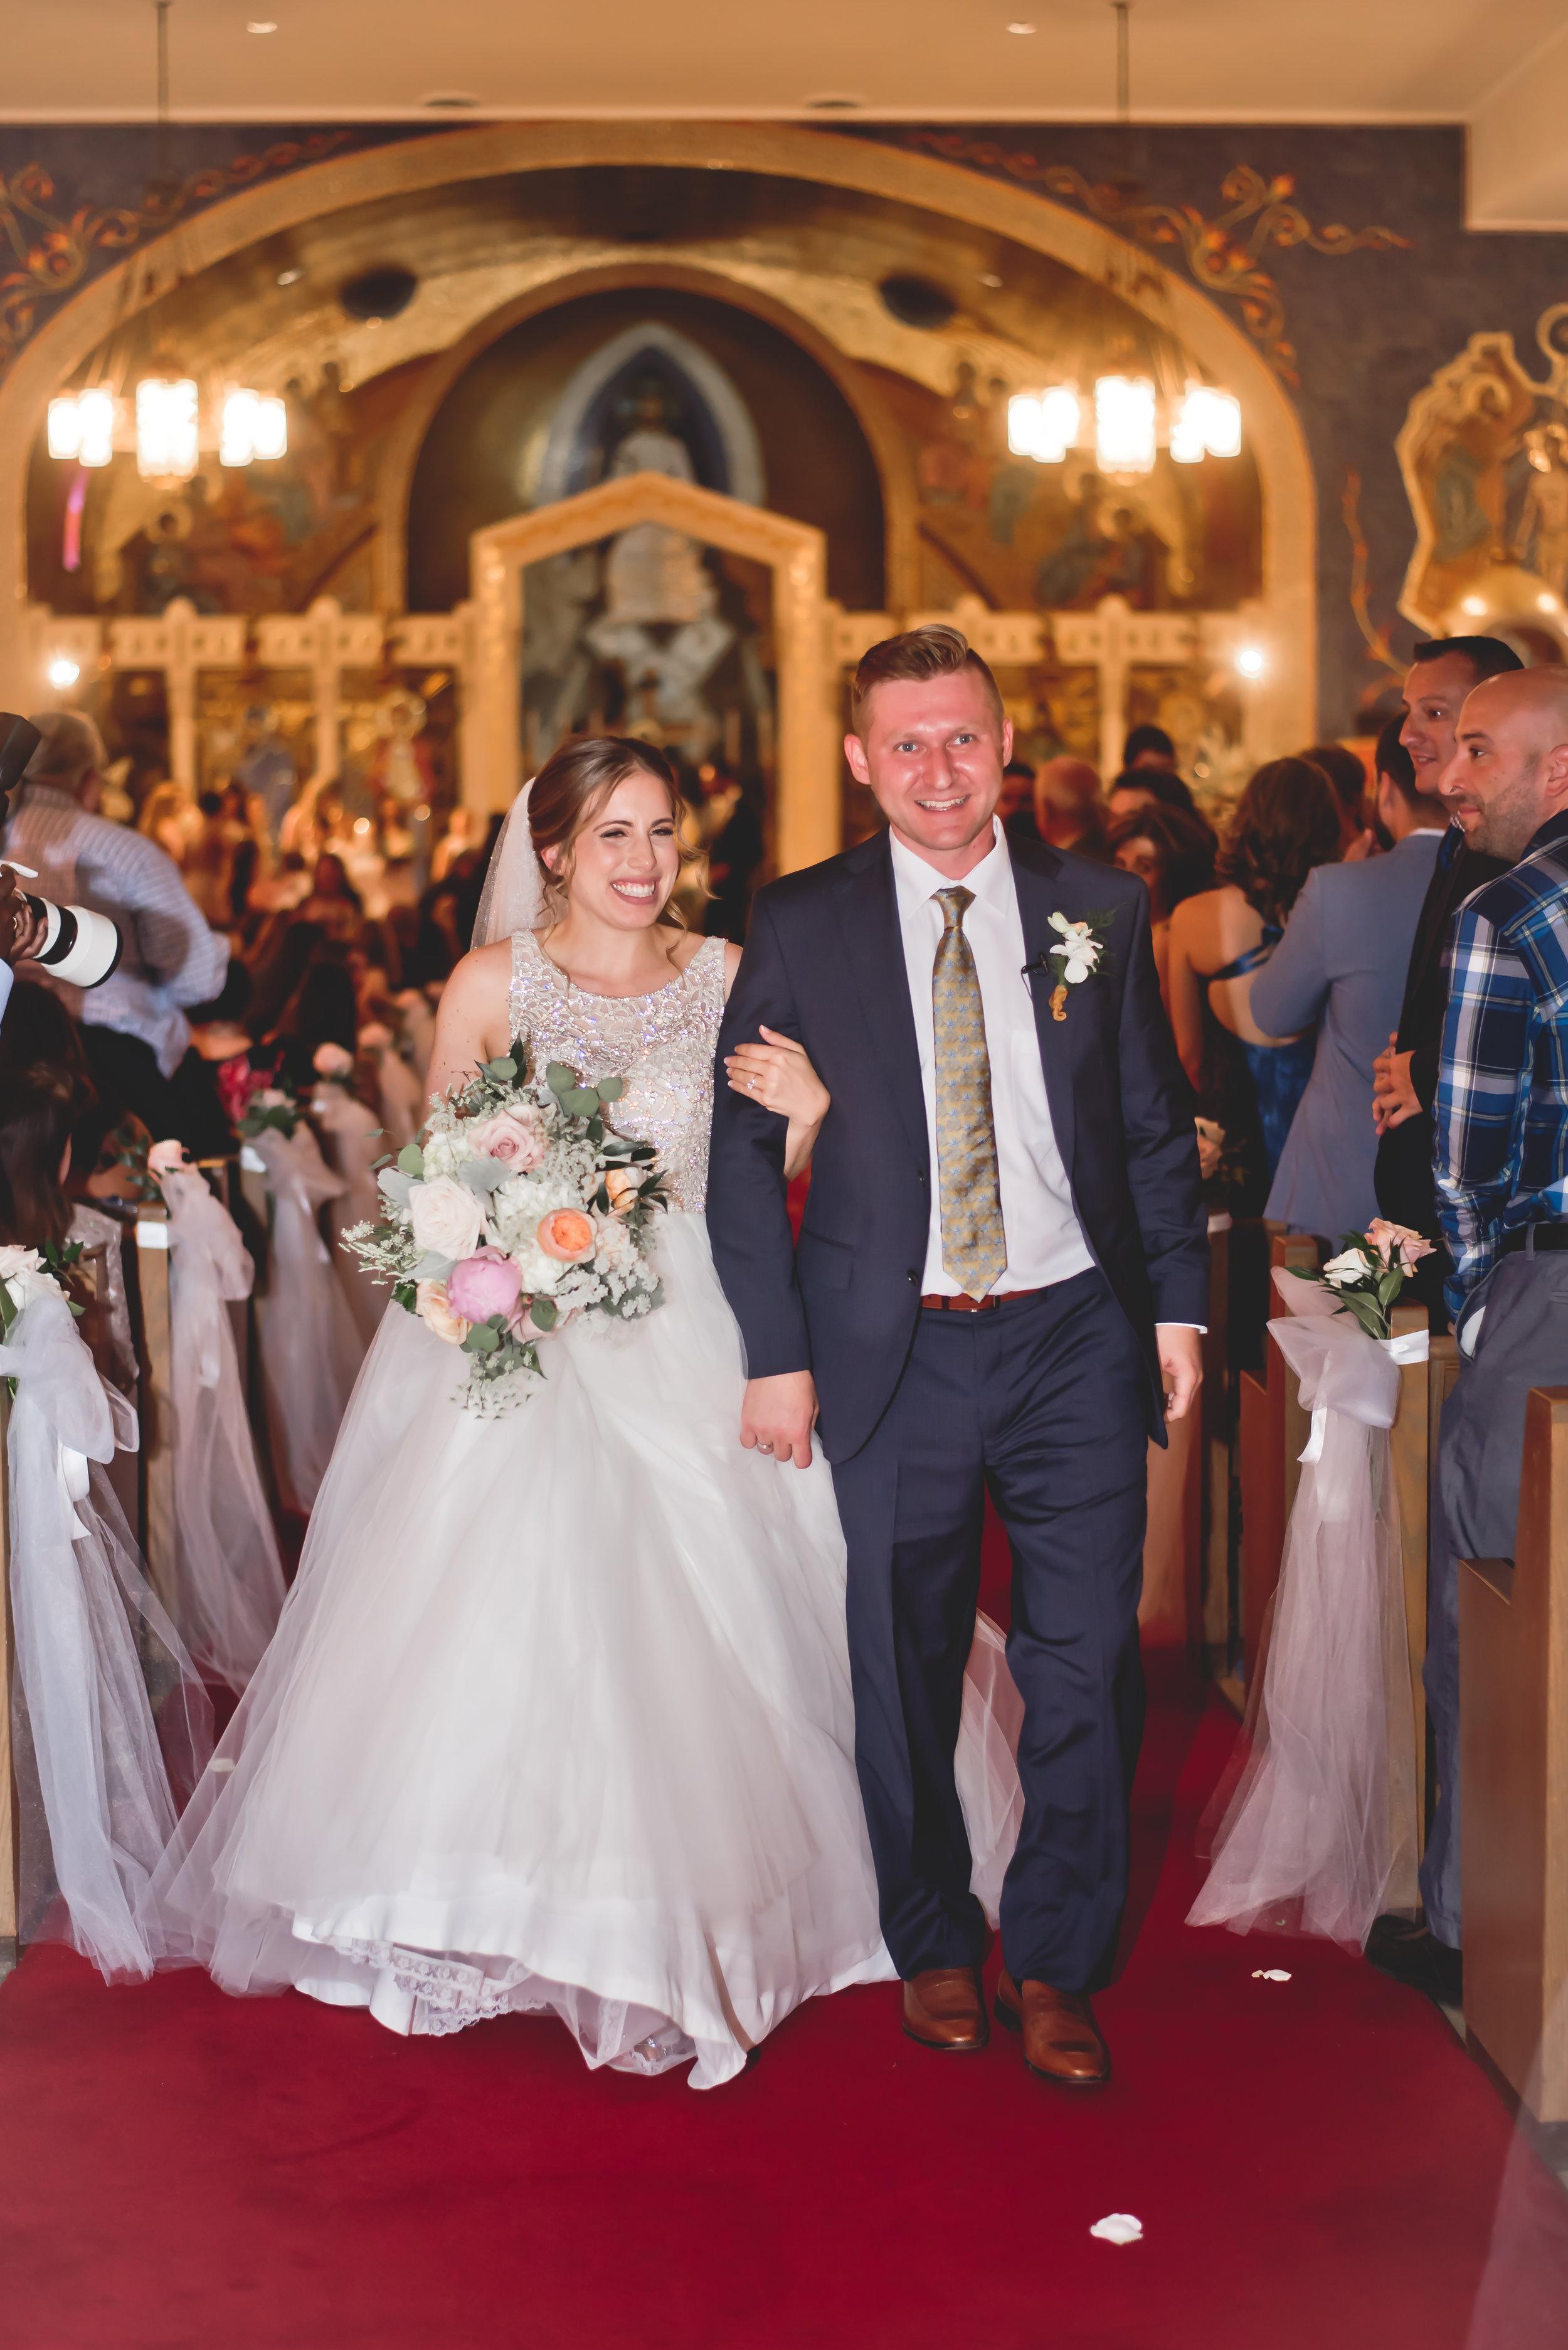 Demko Wedding Pic.jpg